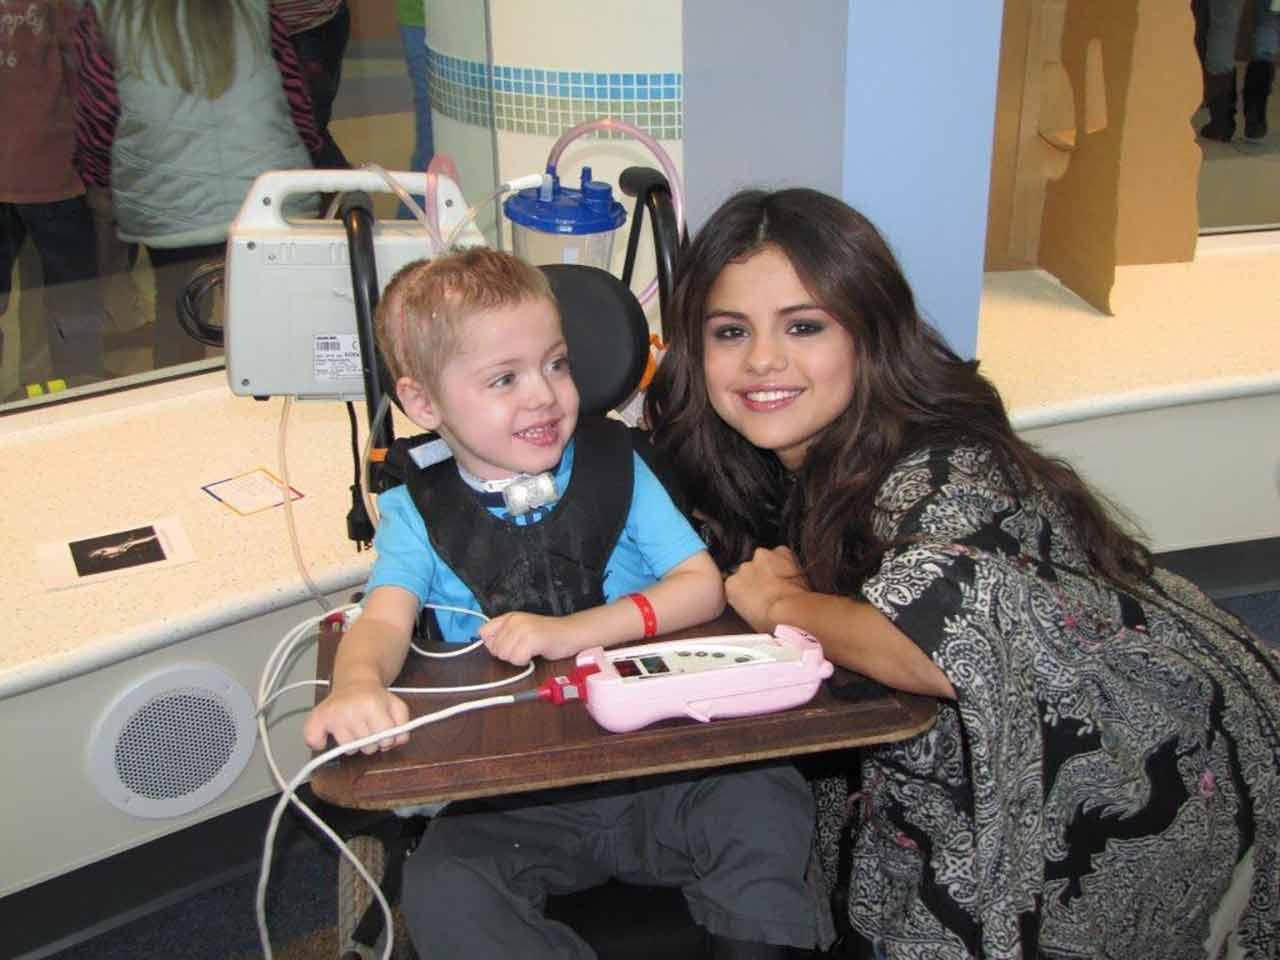 Selena18.jpg Selena18.jpg